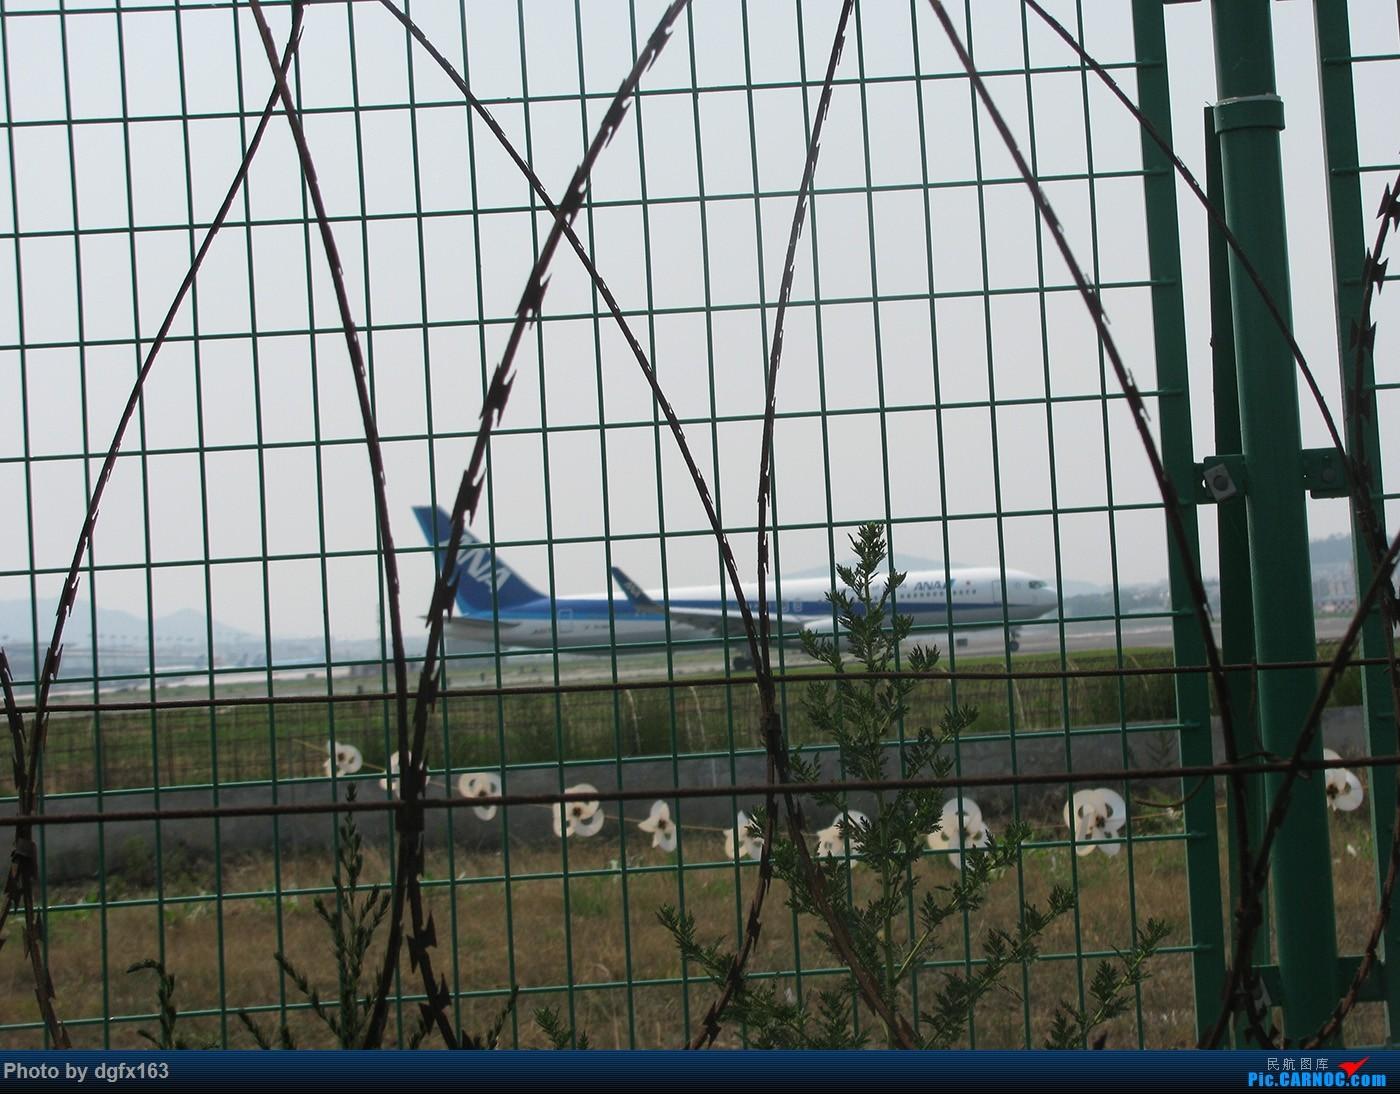 Re:[原创]【dgfx163的拍机(1)大连周水子DLC,烈日拍机1小时半。全日空、日本航空、大韩。。。还不错 BOEING 767-300ER JA627A 中国大连周水子国际机场